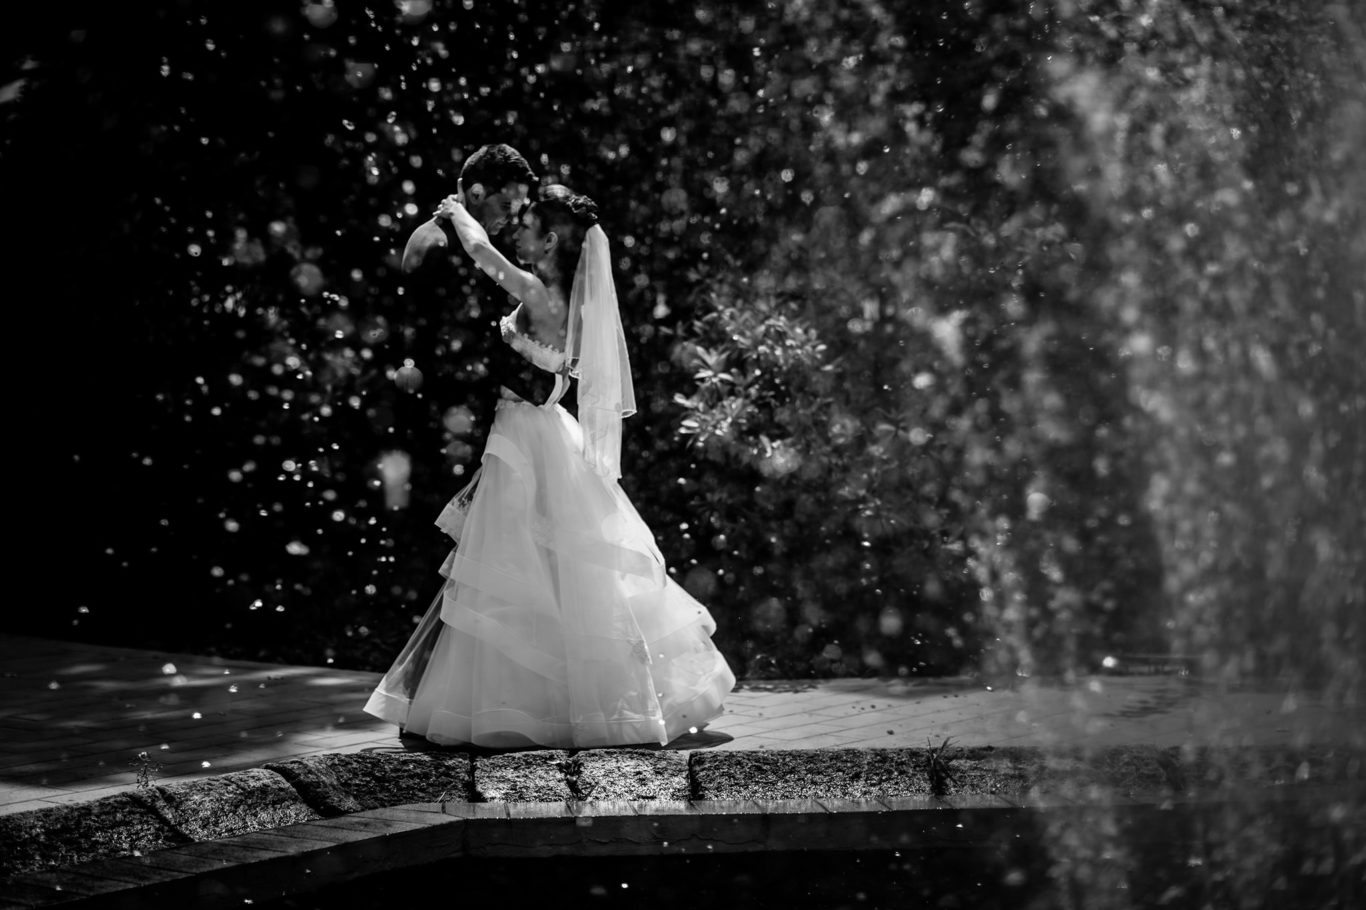 0183-fotografie-nunta-bucuresti-cristina-nicusor-fotograf-ciprian-dumitrescu-cd2_1094